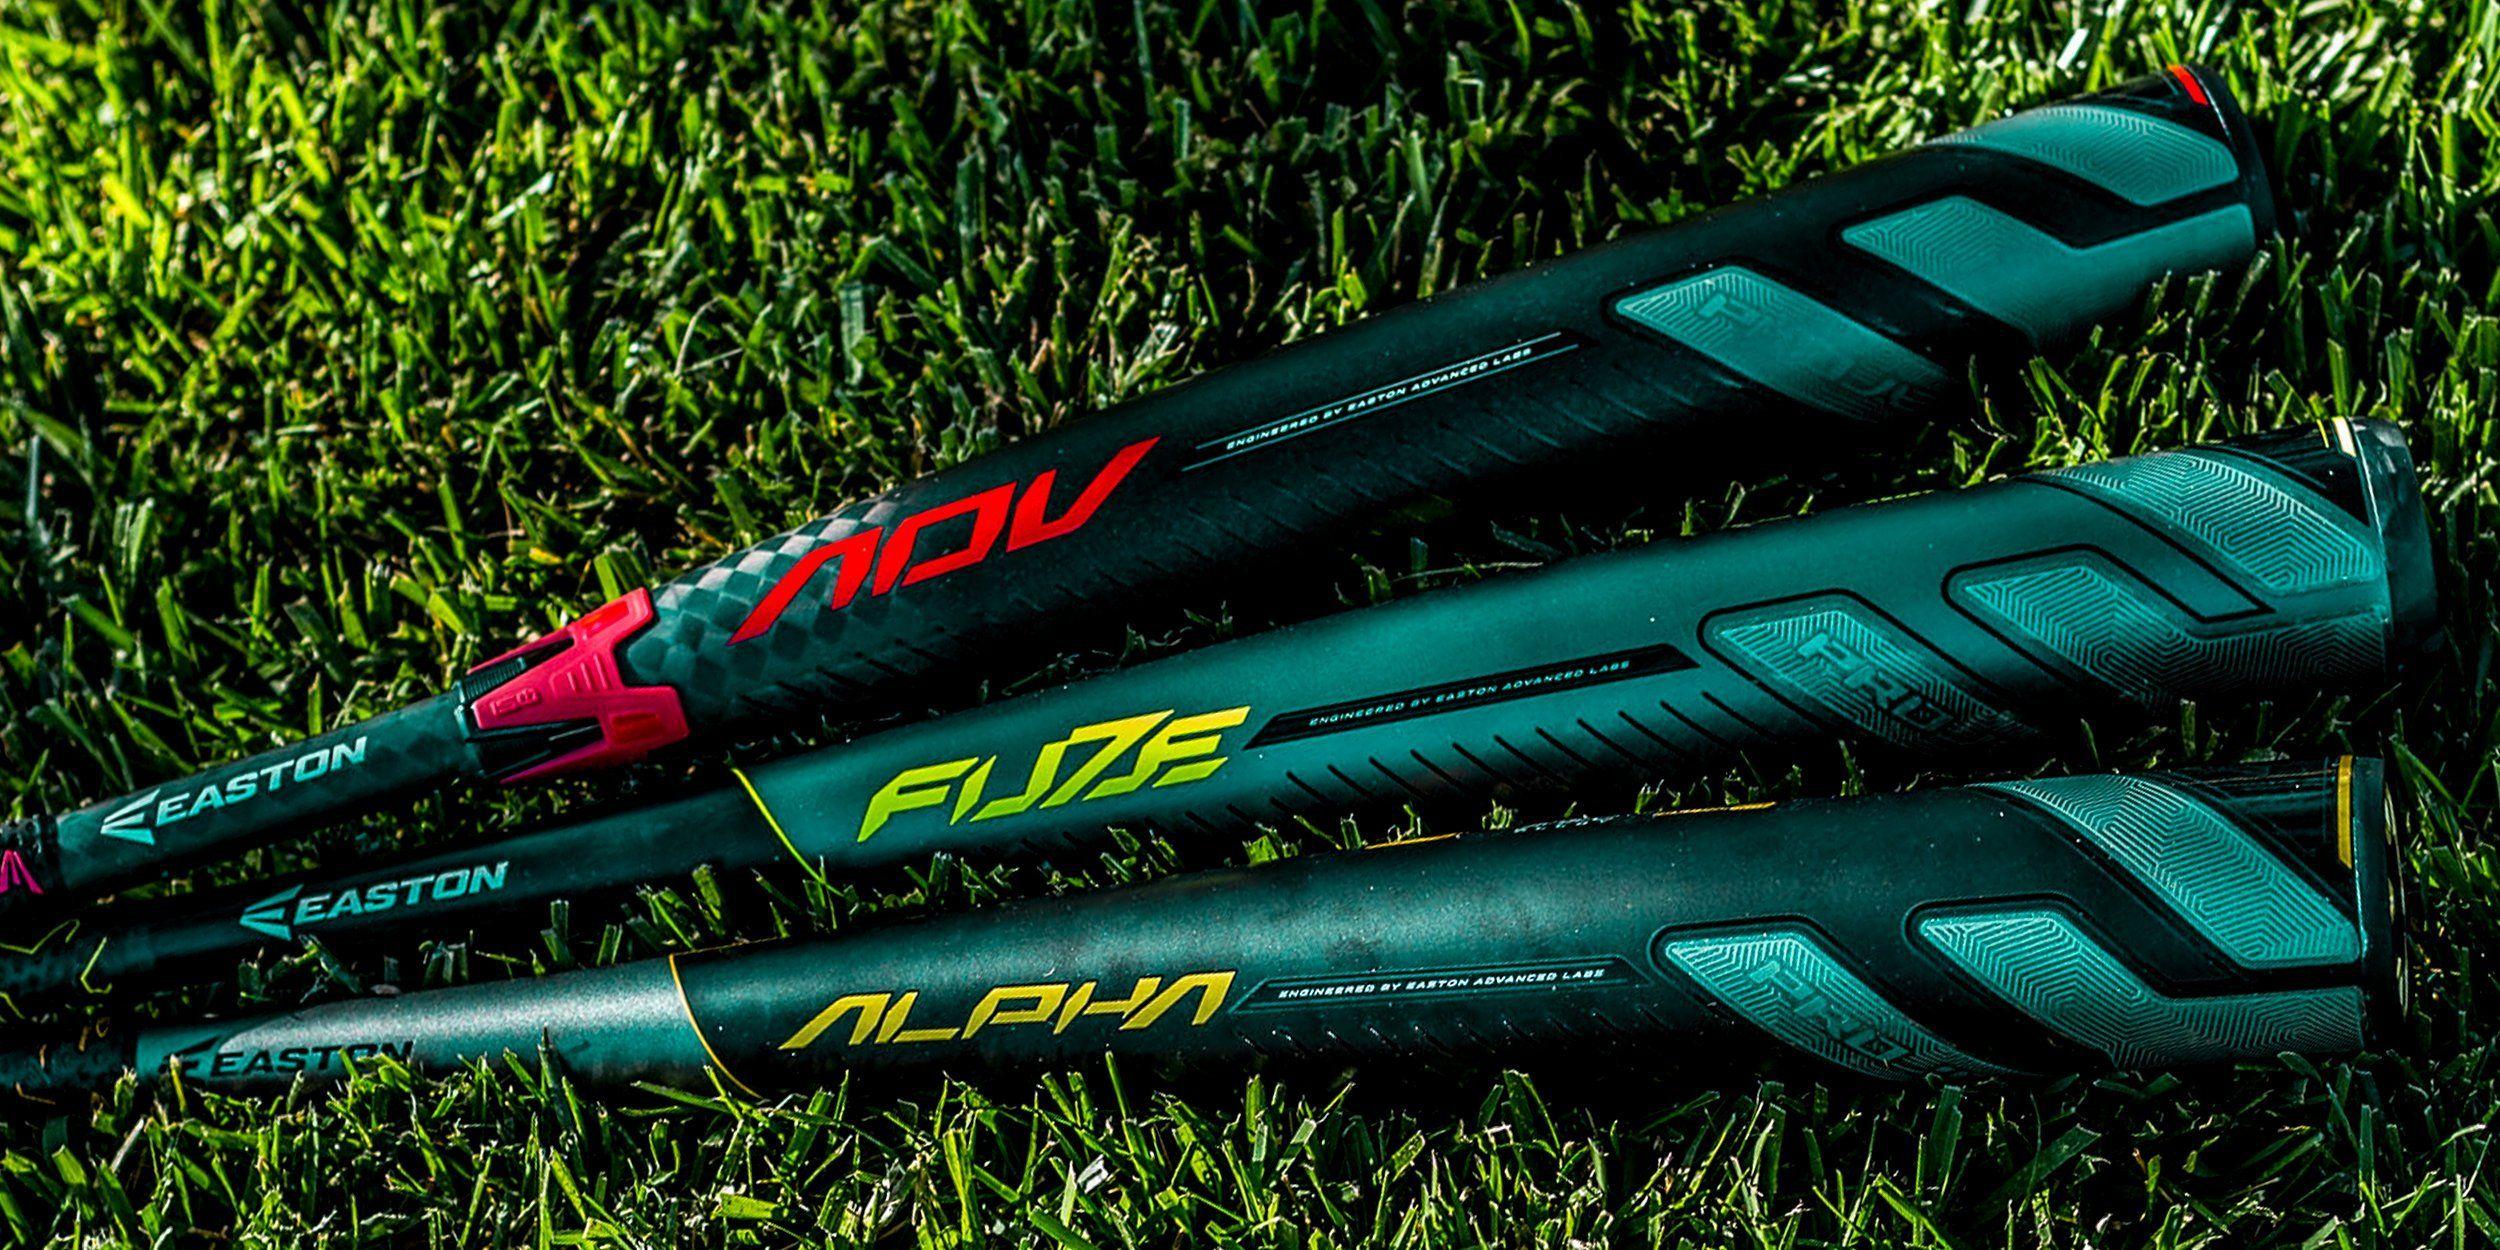 2018-2019-baseball-bats-outlet